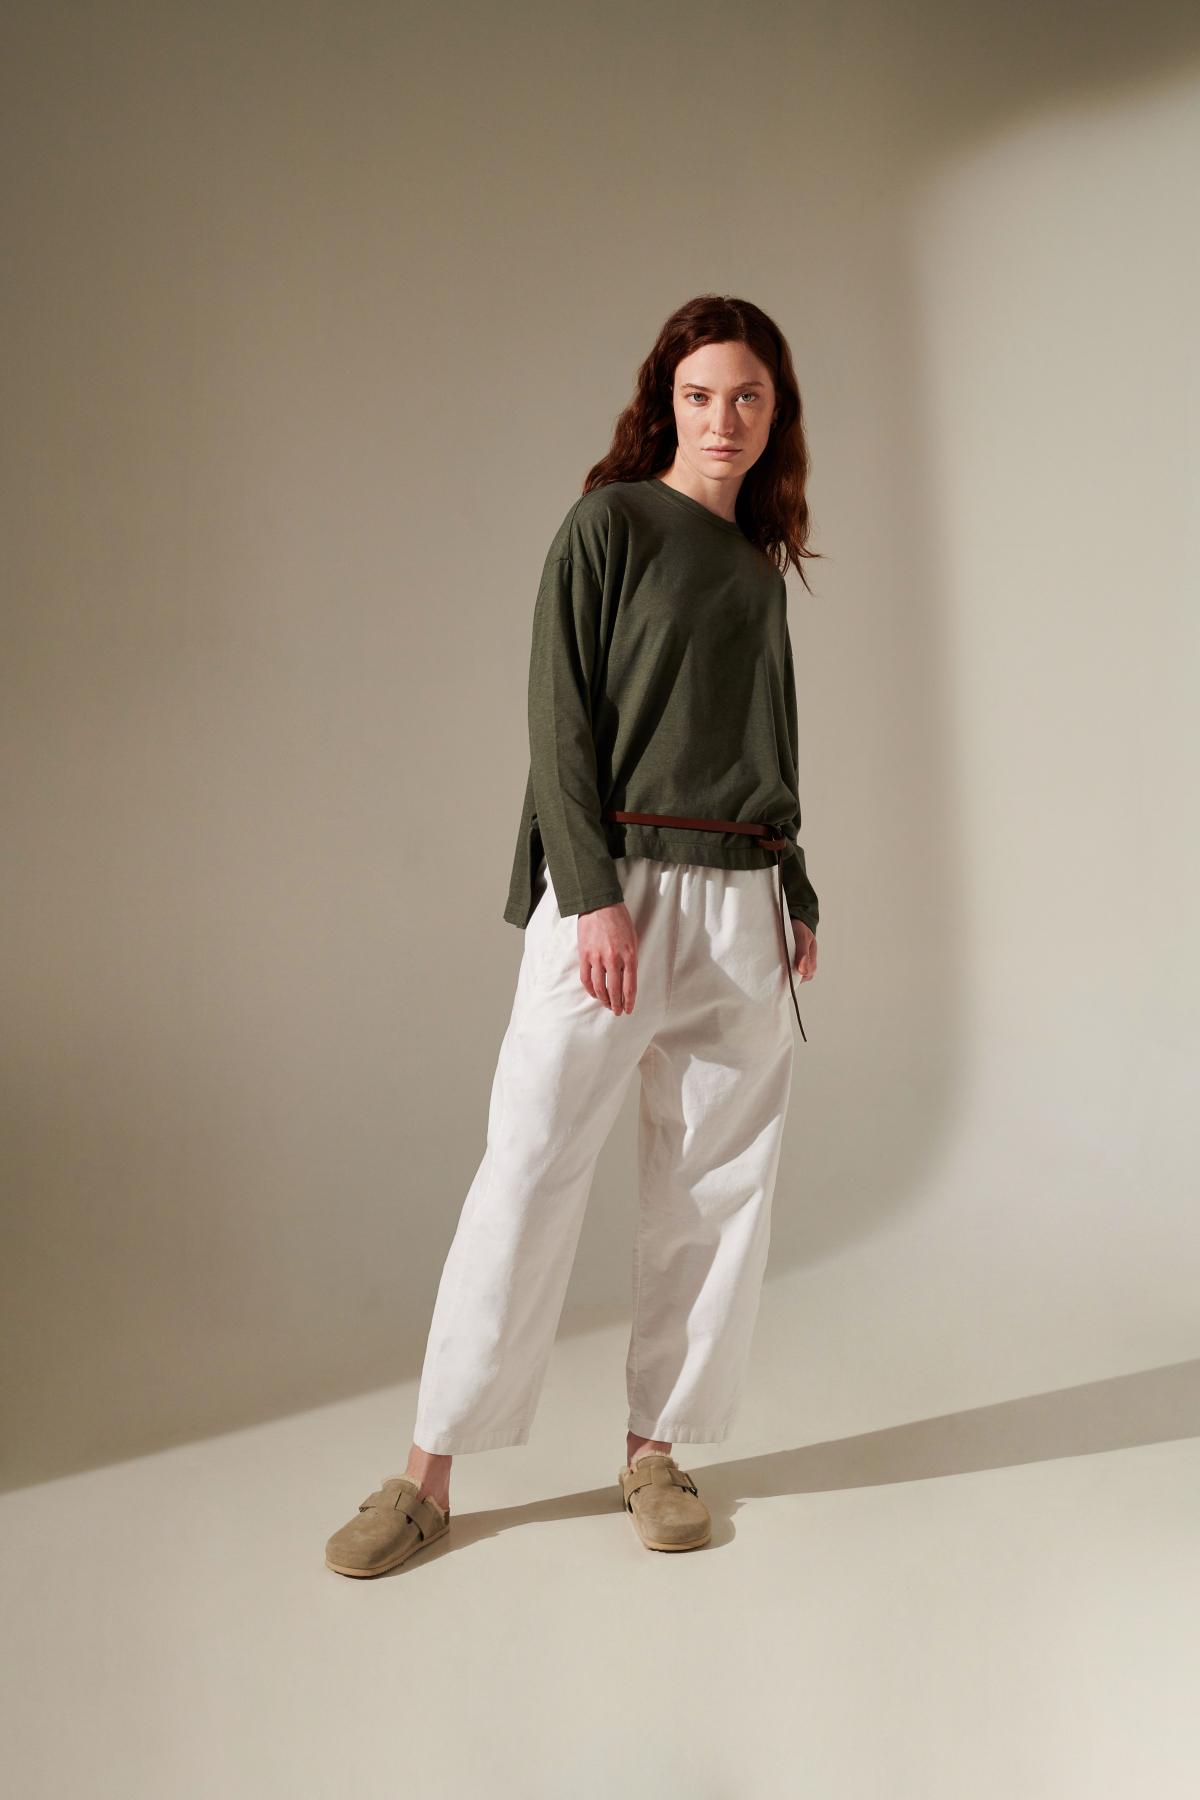 style TAPIOCAJAC tshirt  style GELATOMAN skirt